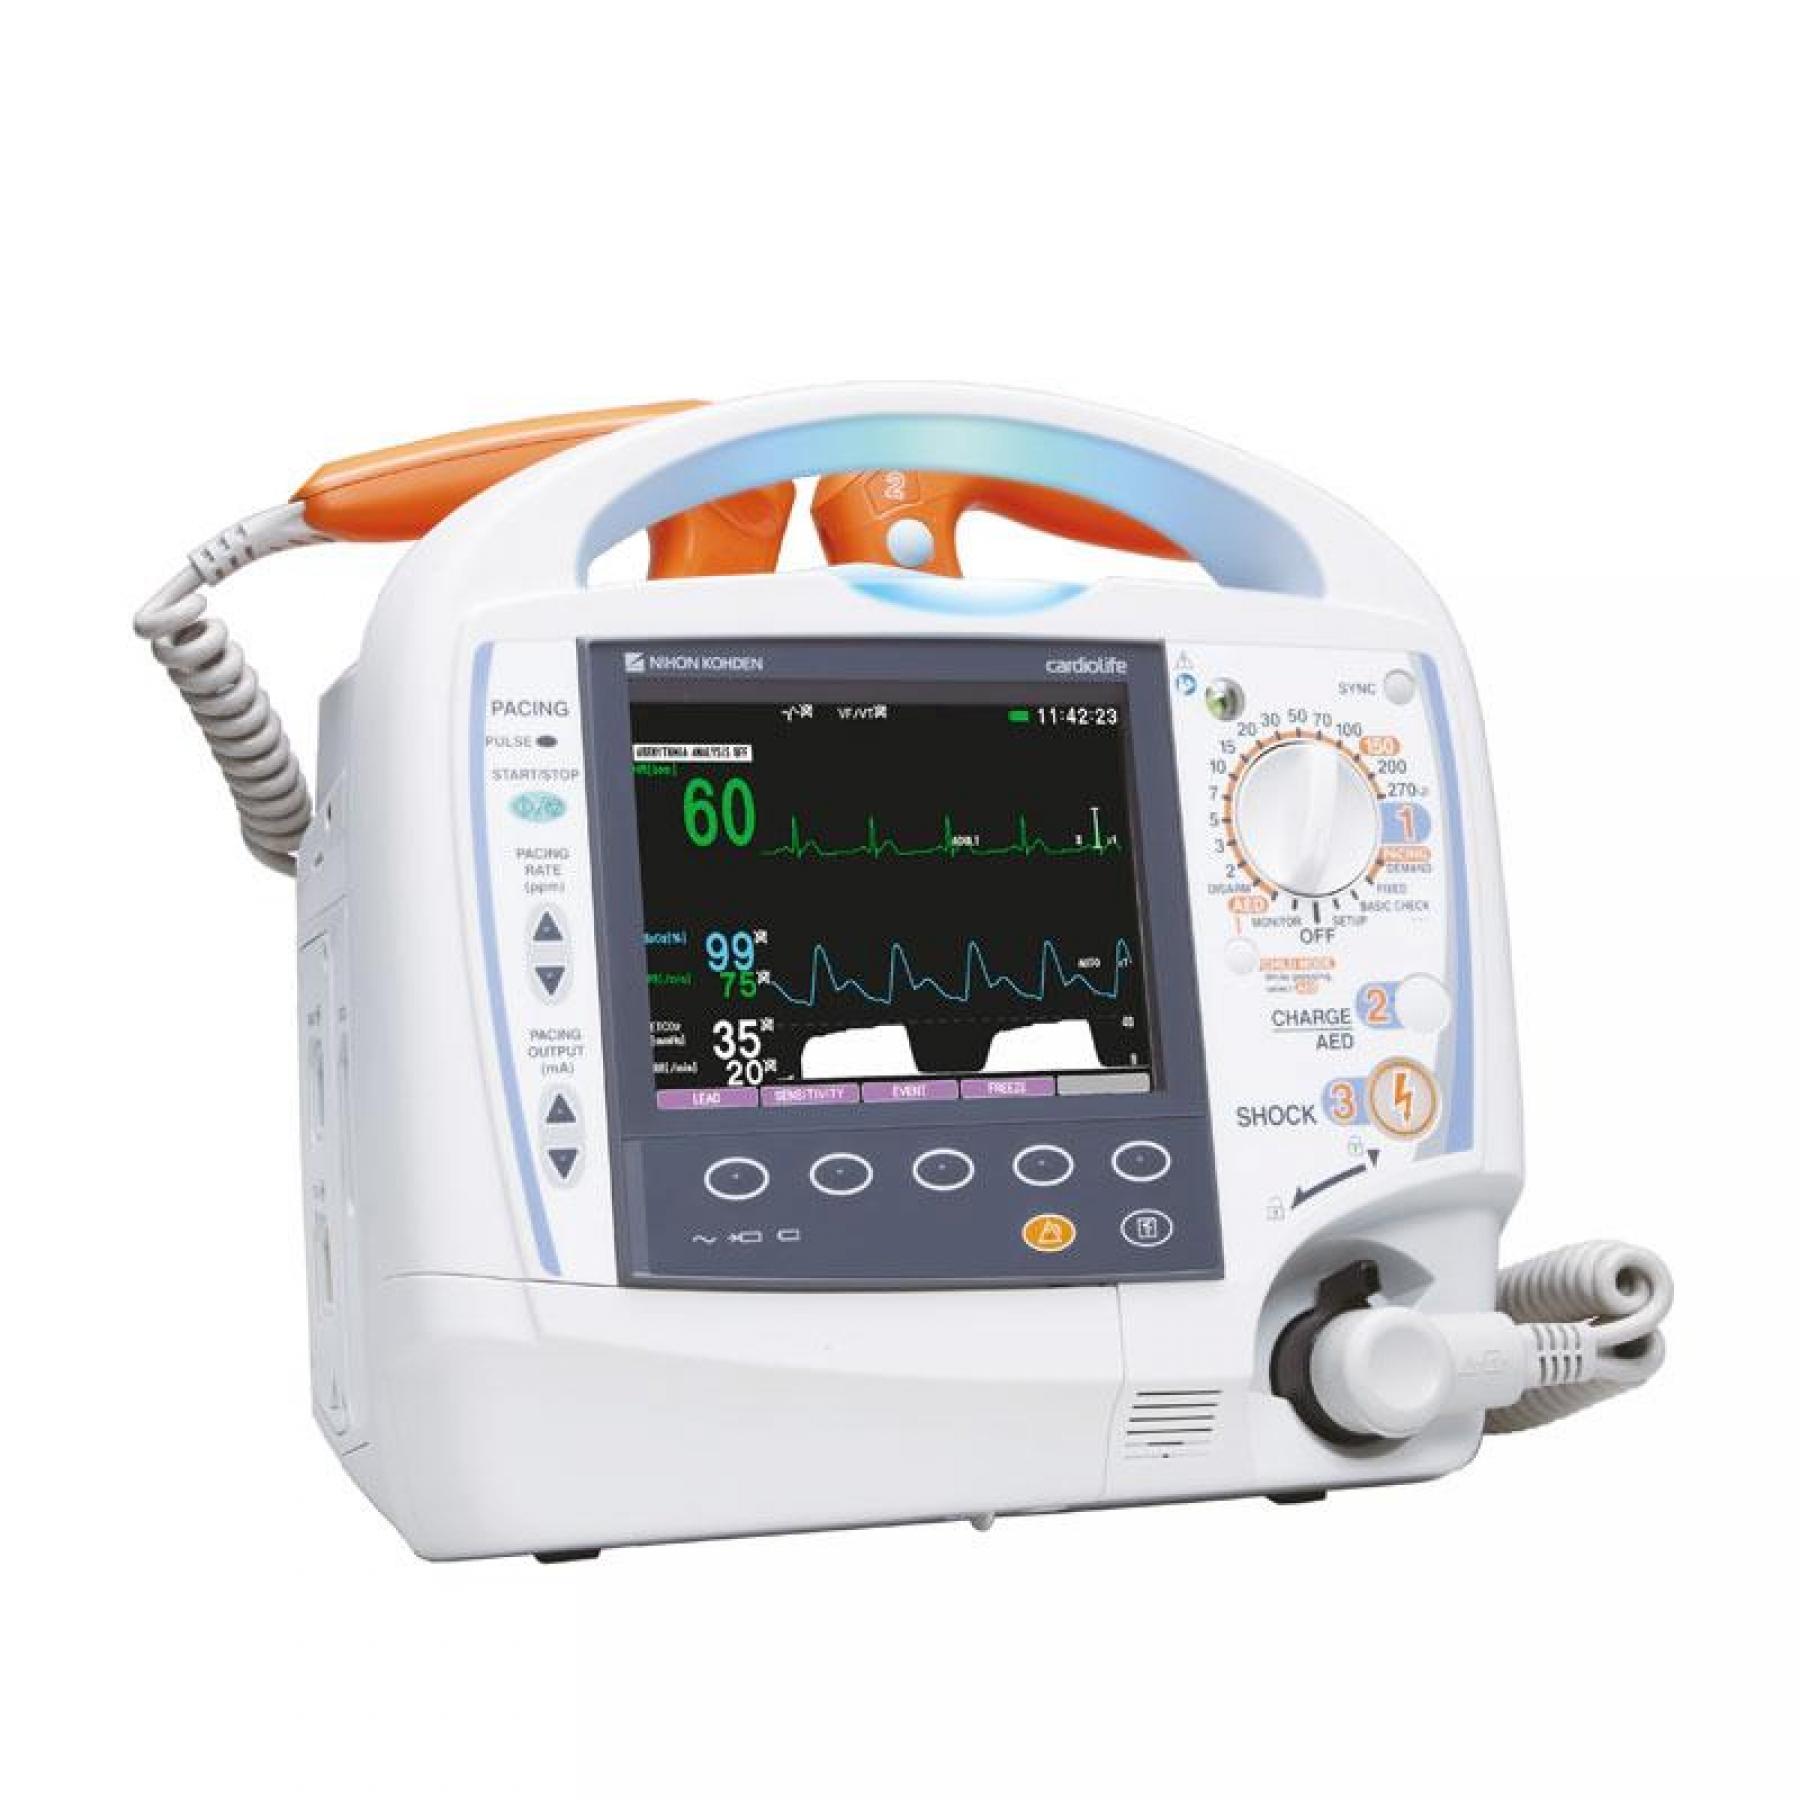 Nihon Kohden-Cardiolife TEC-5600